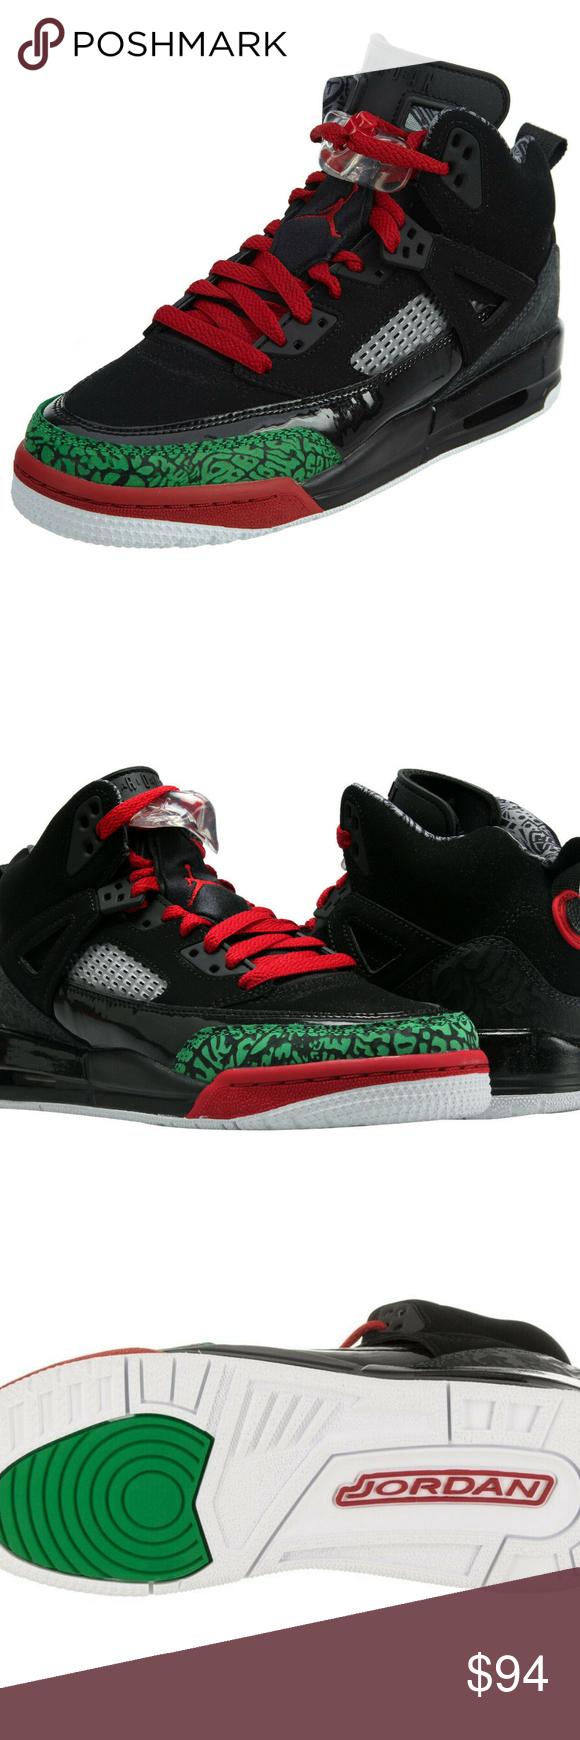 Nike Big Kid/'s Jordan Spizike OG Shoe NEW AUTHENTIC Black//Green//Red 317321-026